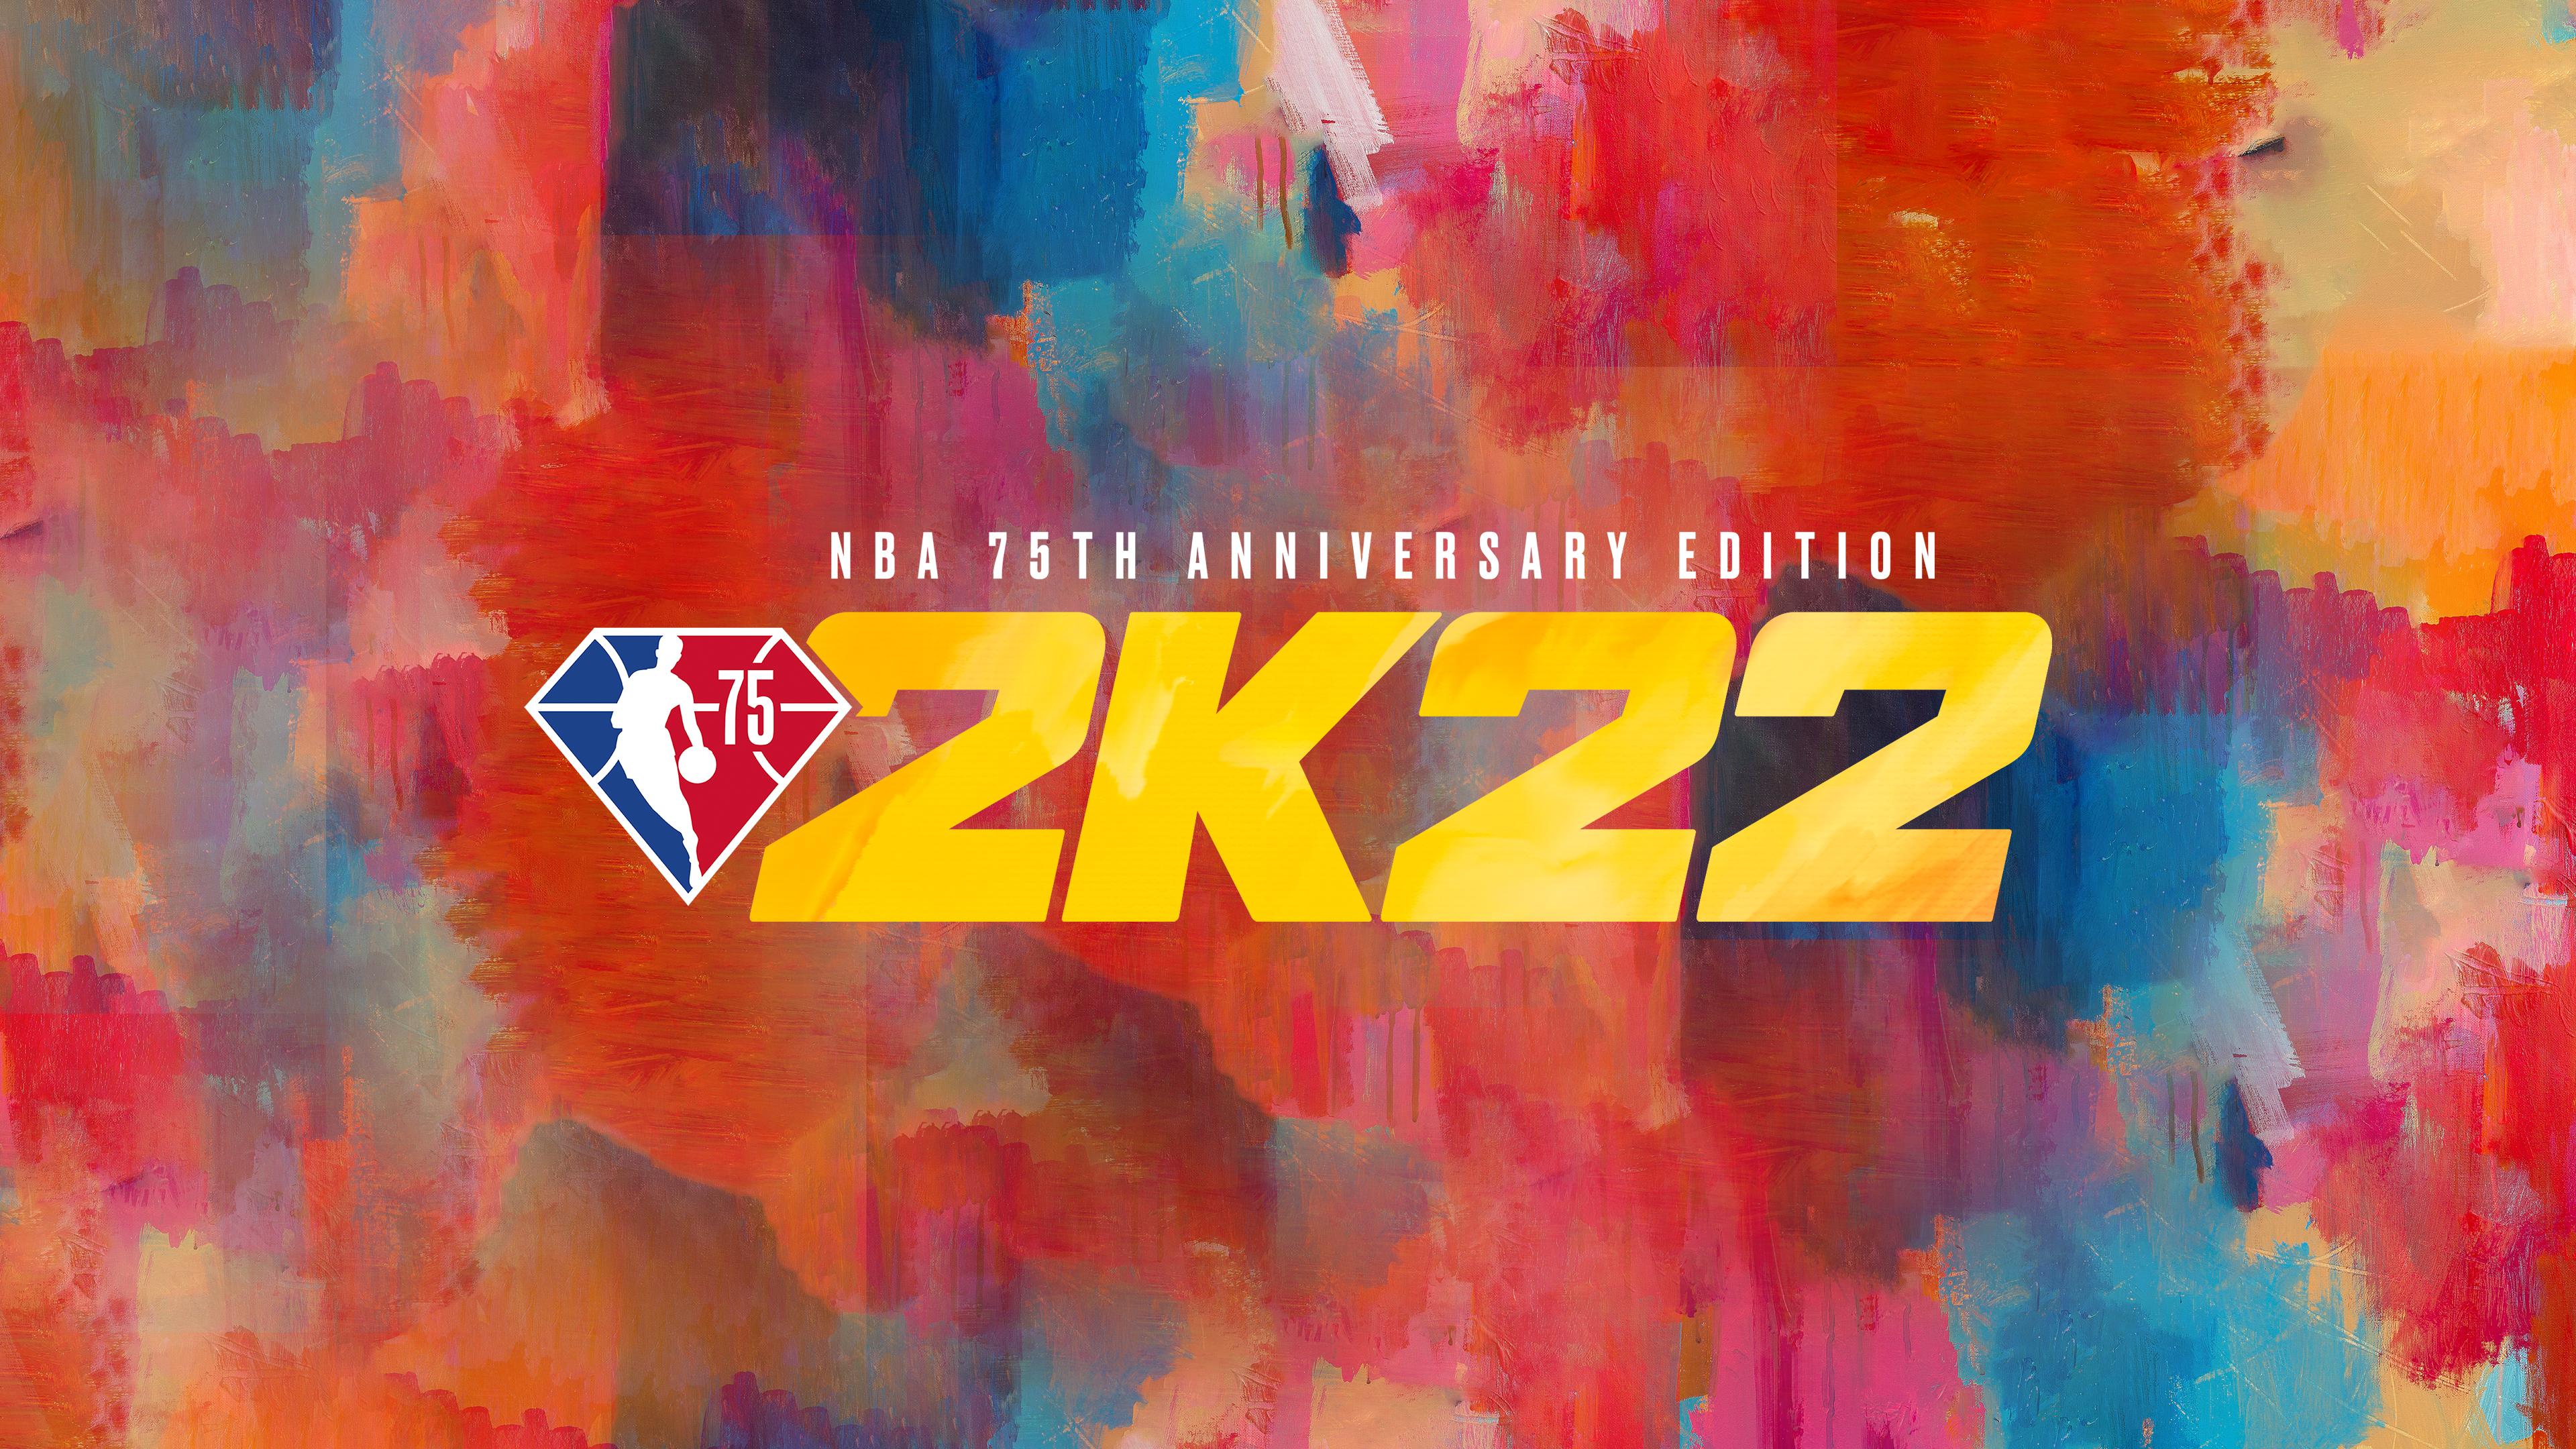 Скриншот №2 к Предзаказ NBA 2K22 NBA 75th Anniversary Edition для PS4 and PS5